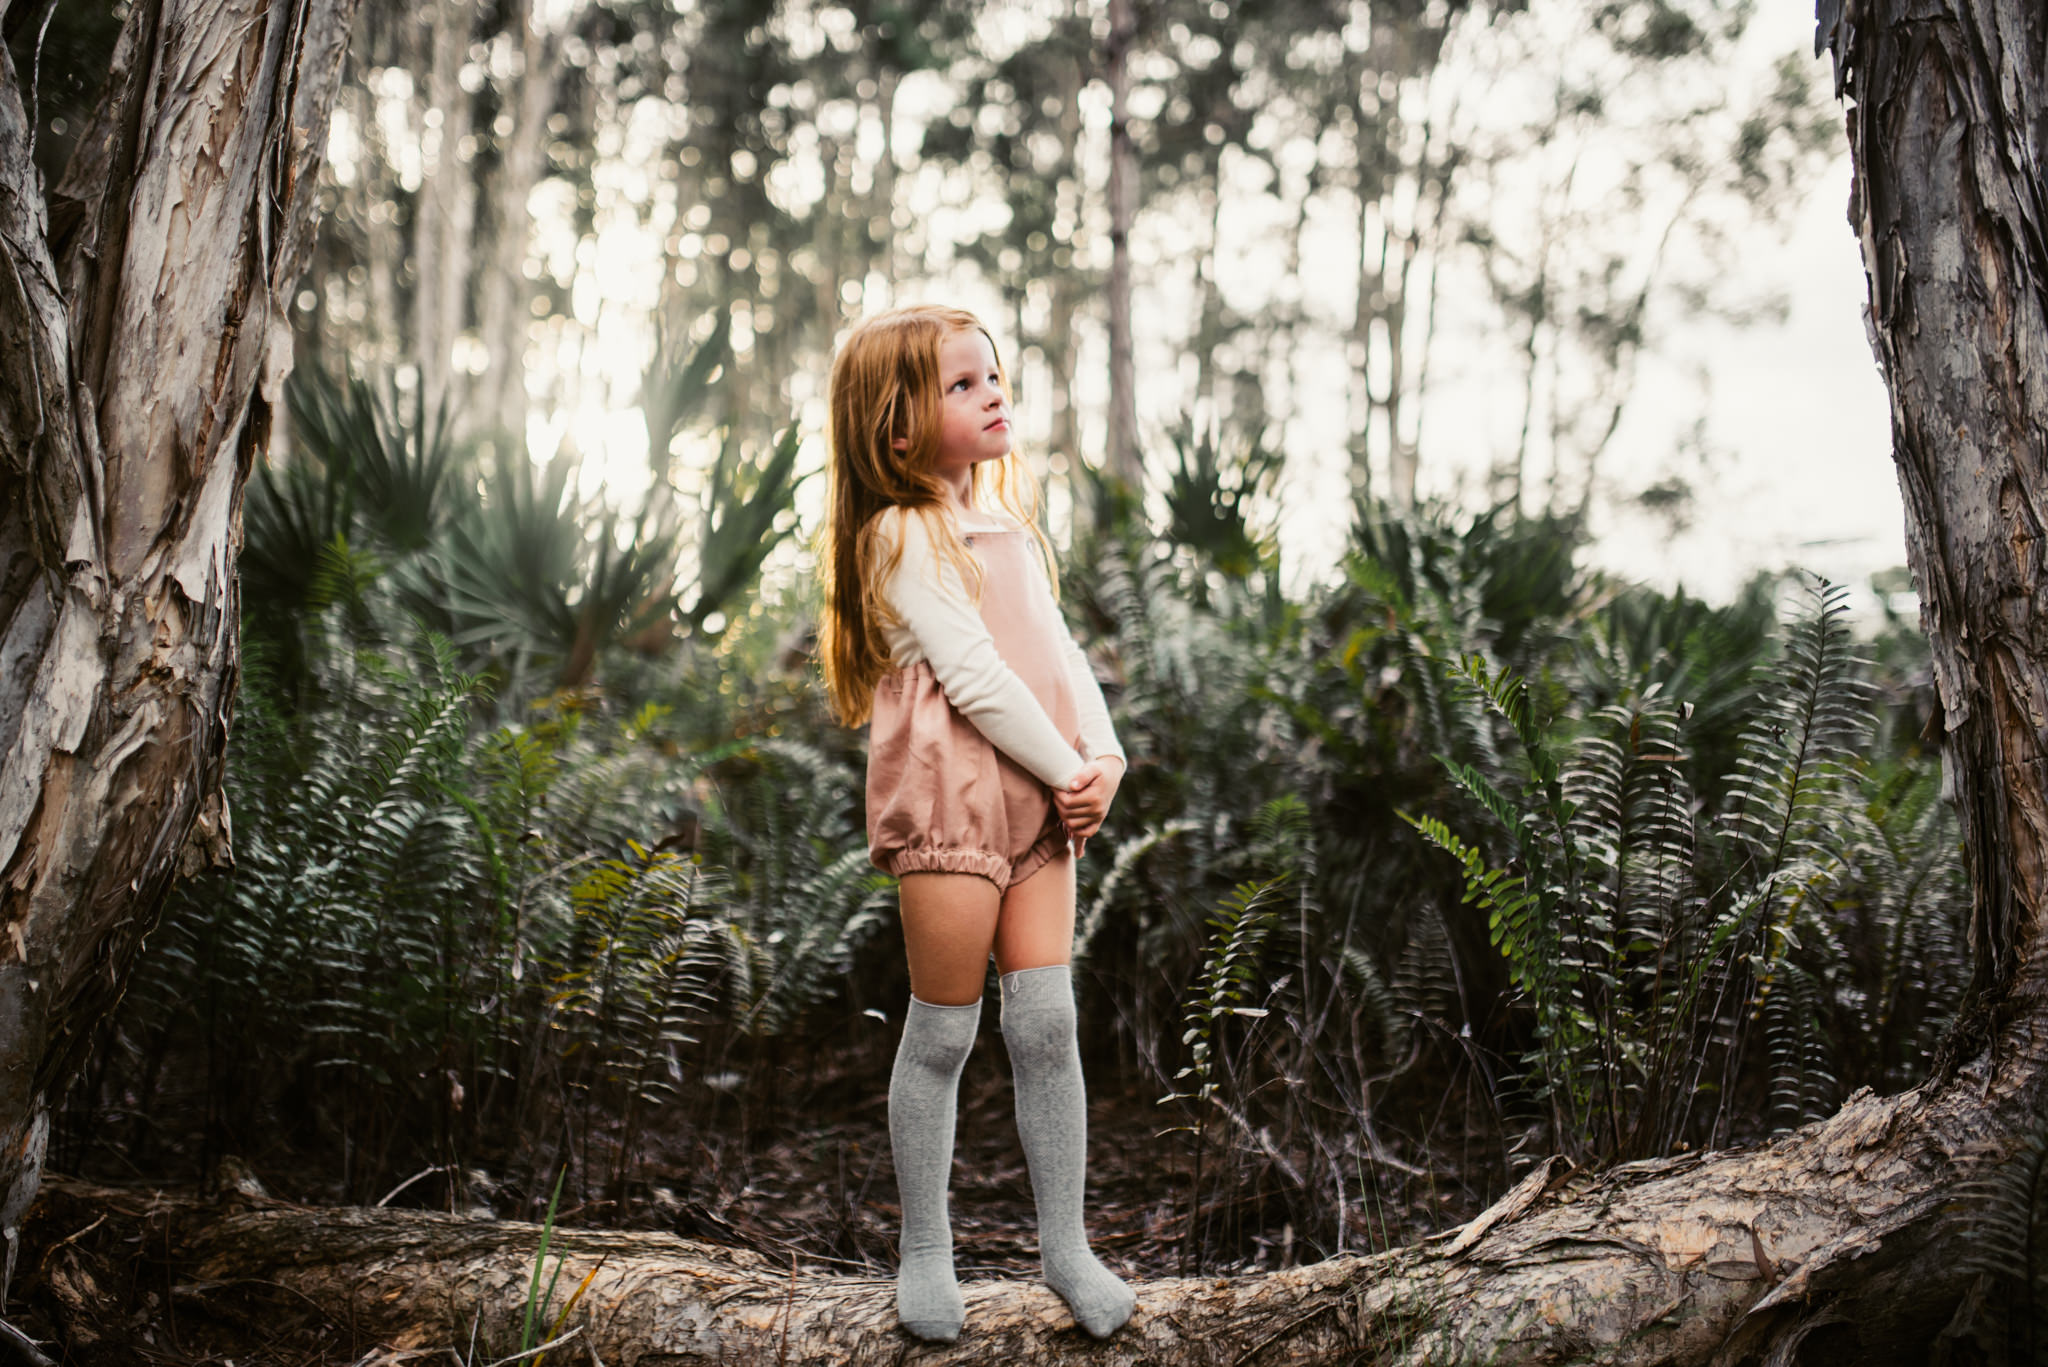 twyla jones photography - treasure coast florida - childrens adventure clothing commercial shoot--28.jpg